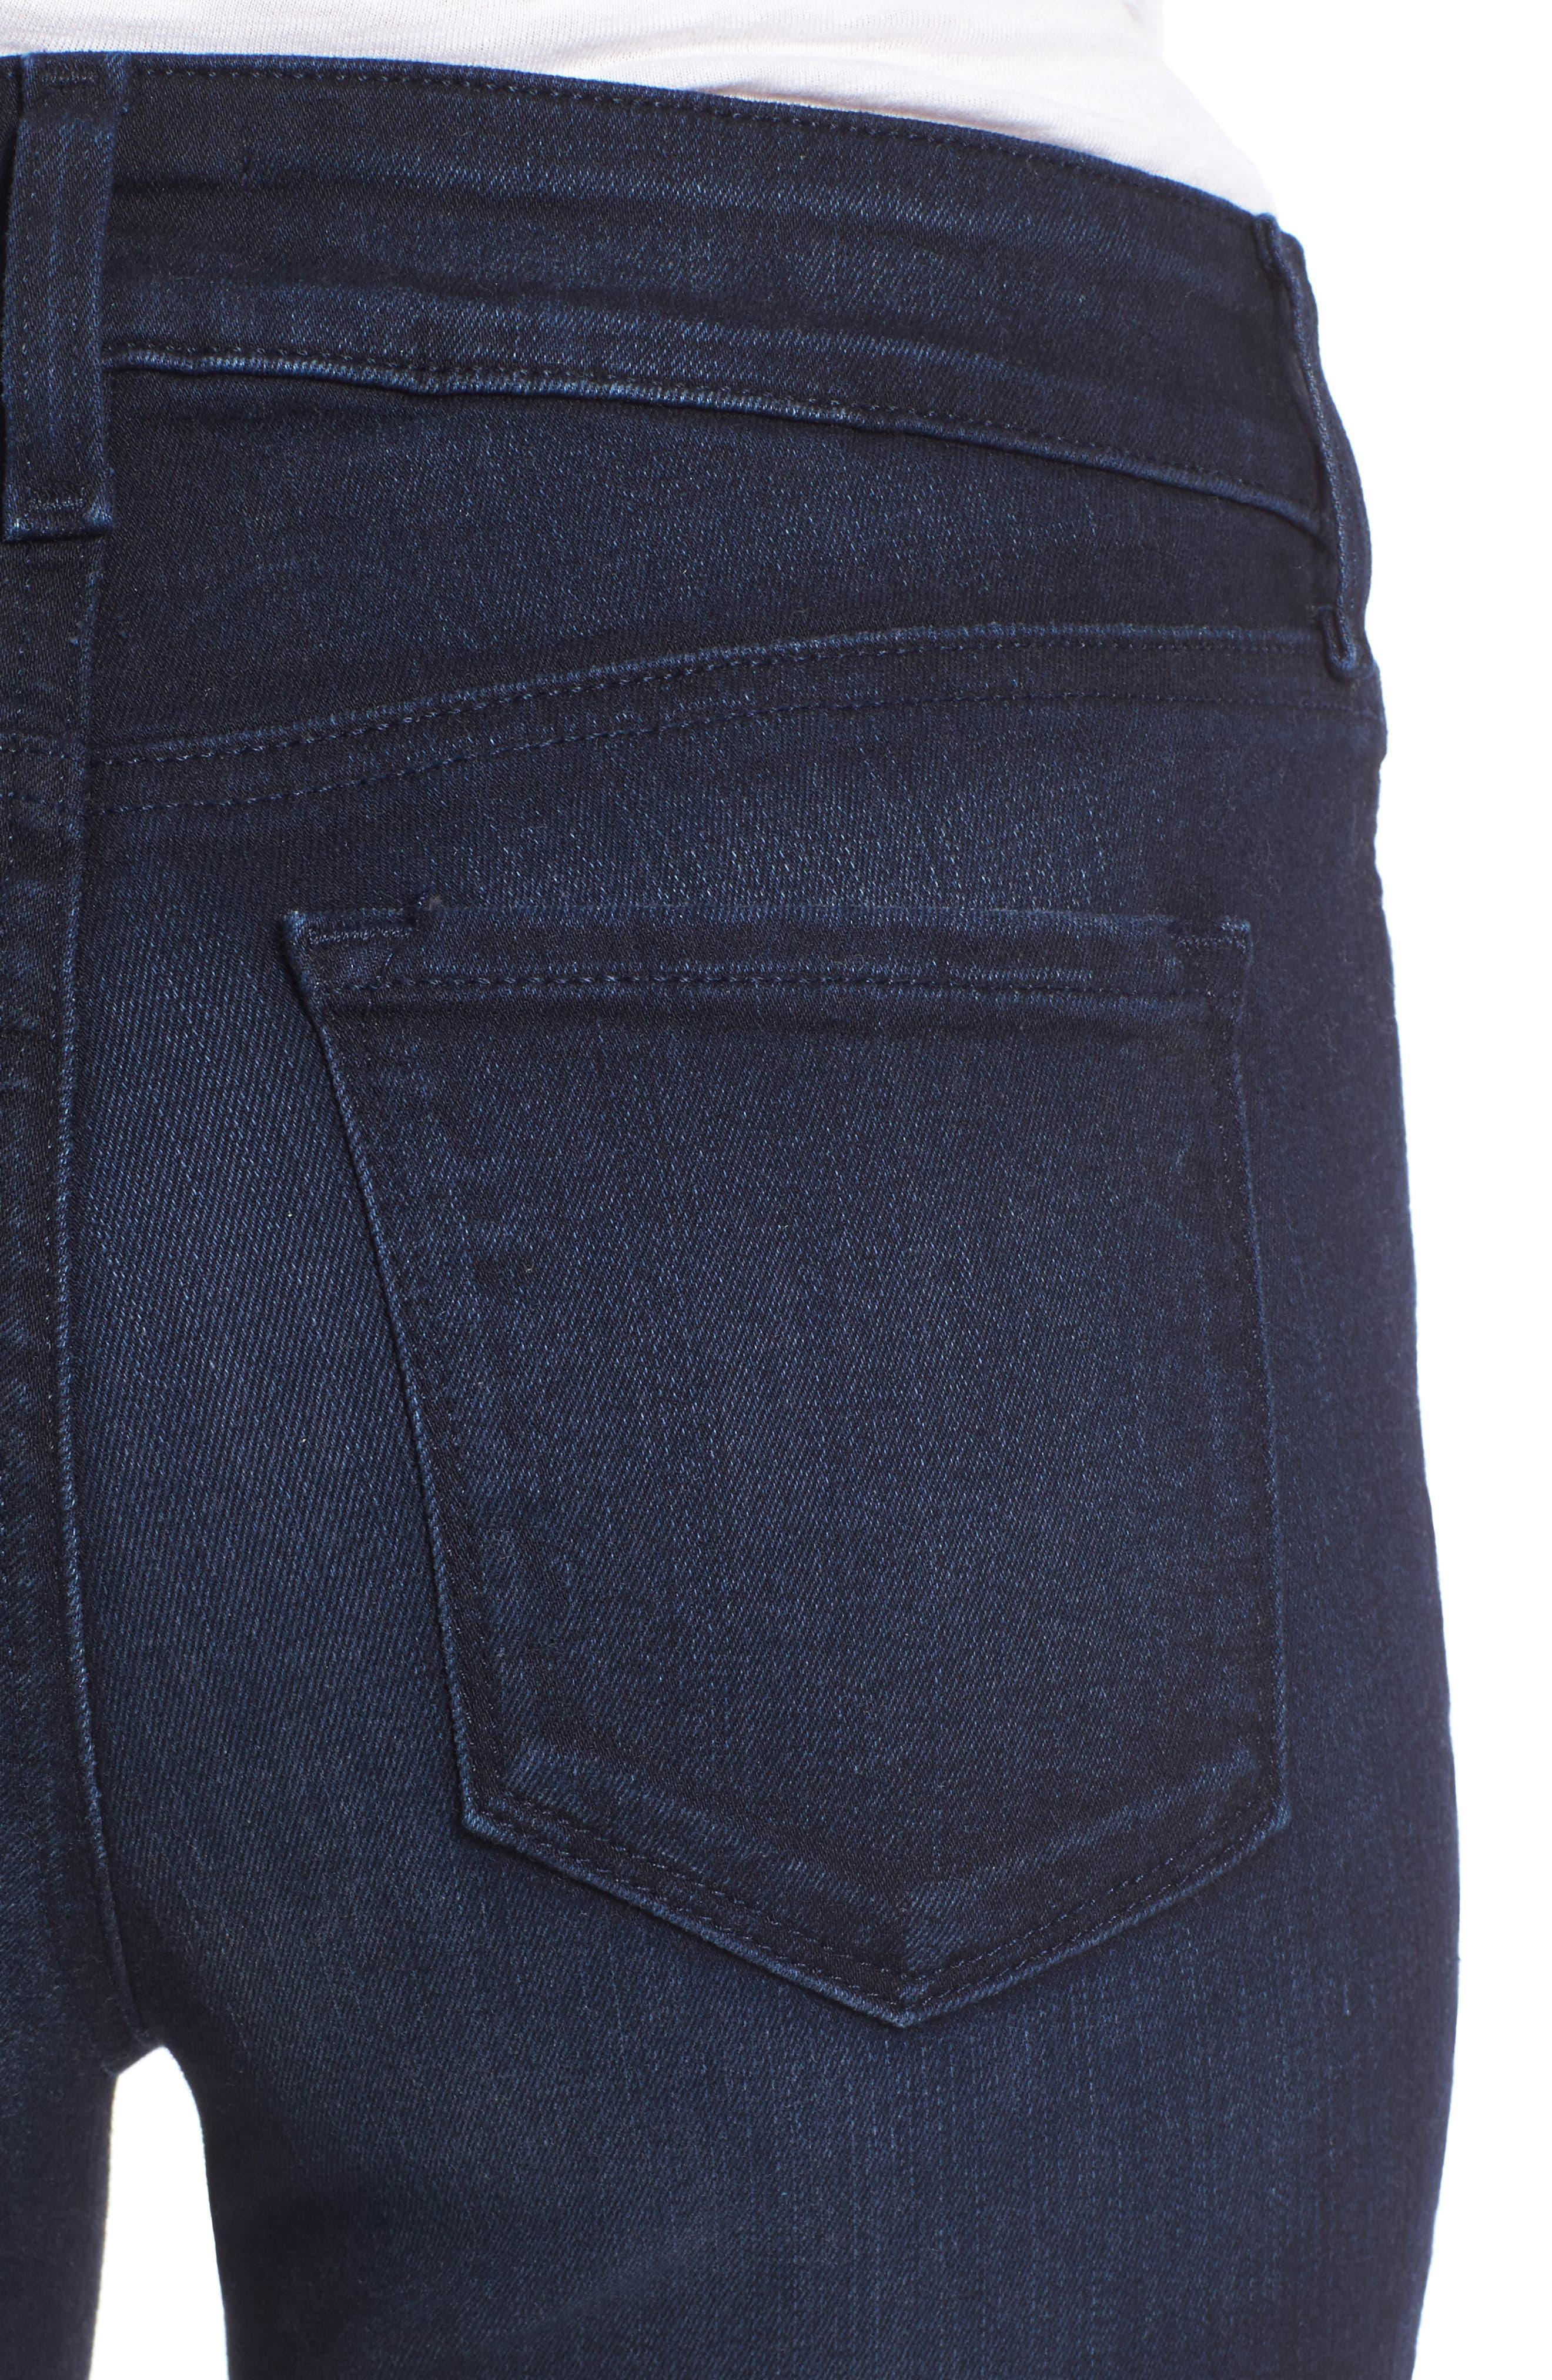 Alternate Image 5  - NYDJ Ami Stretch Ankle Skinny Jeans (Sinclair) (Regular & Petite)